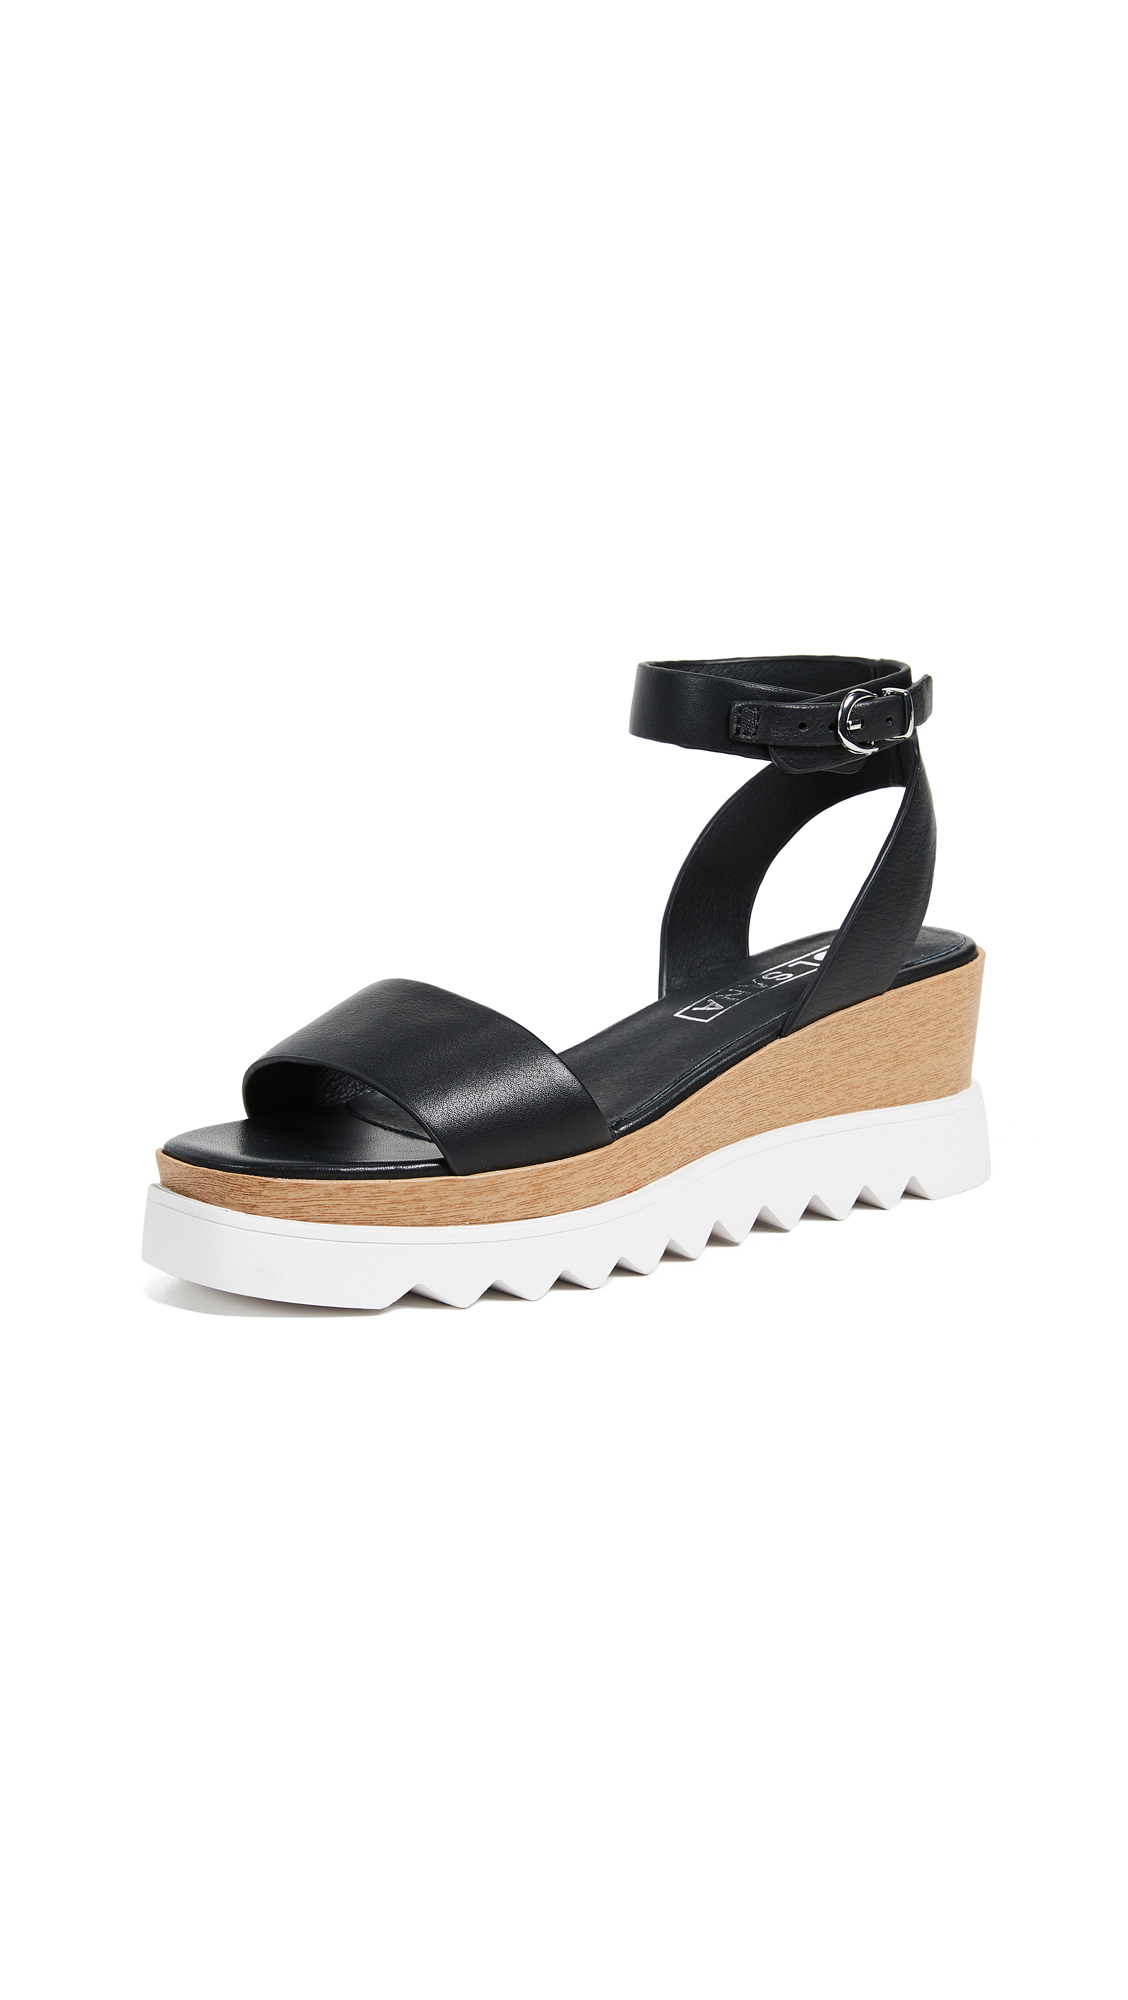 Sol Sana Tray Wedge Sandals - Black